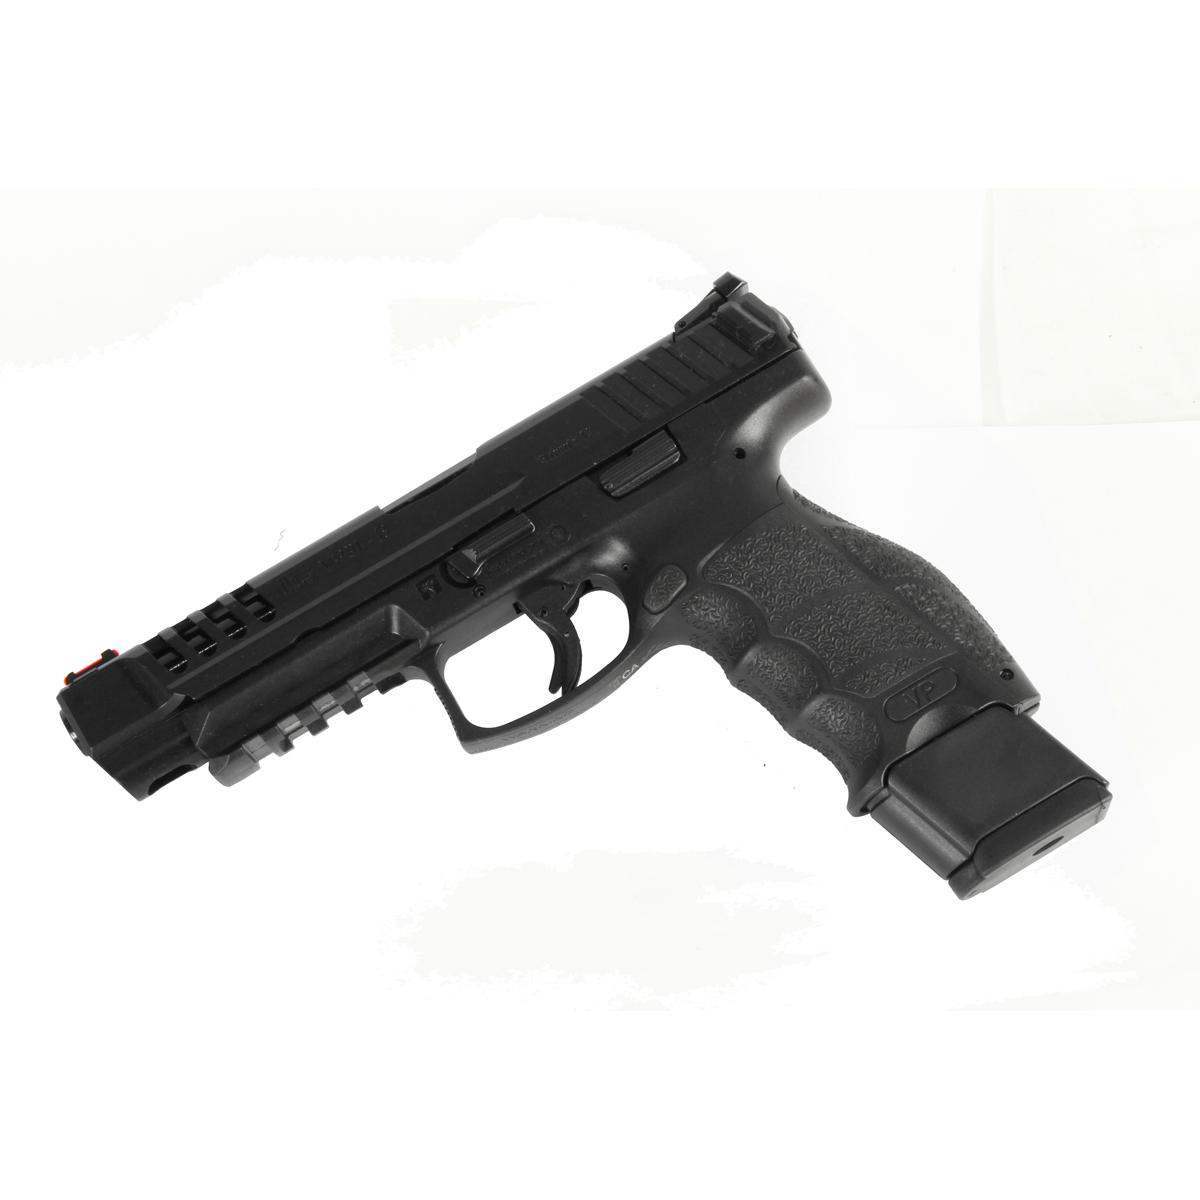 H&K VP9L 9mm Striker Fired, Night Sights, PB Mag Release